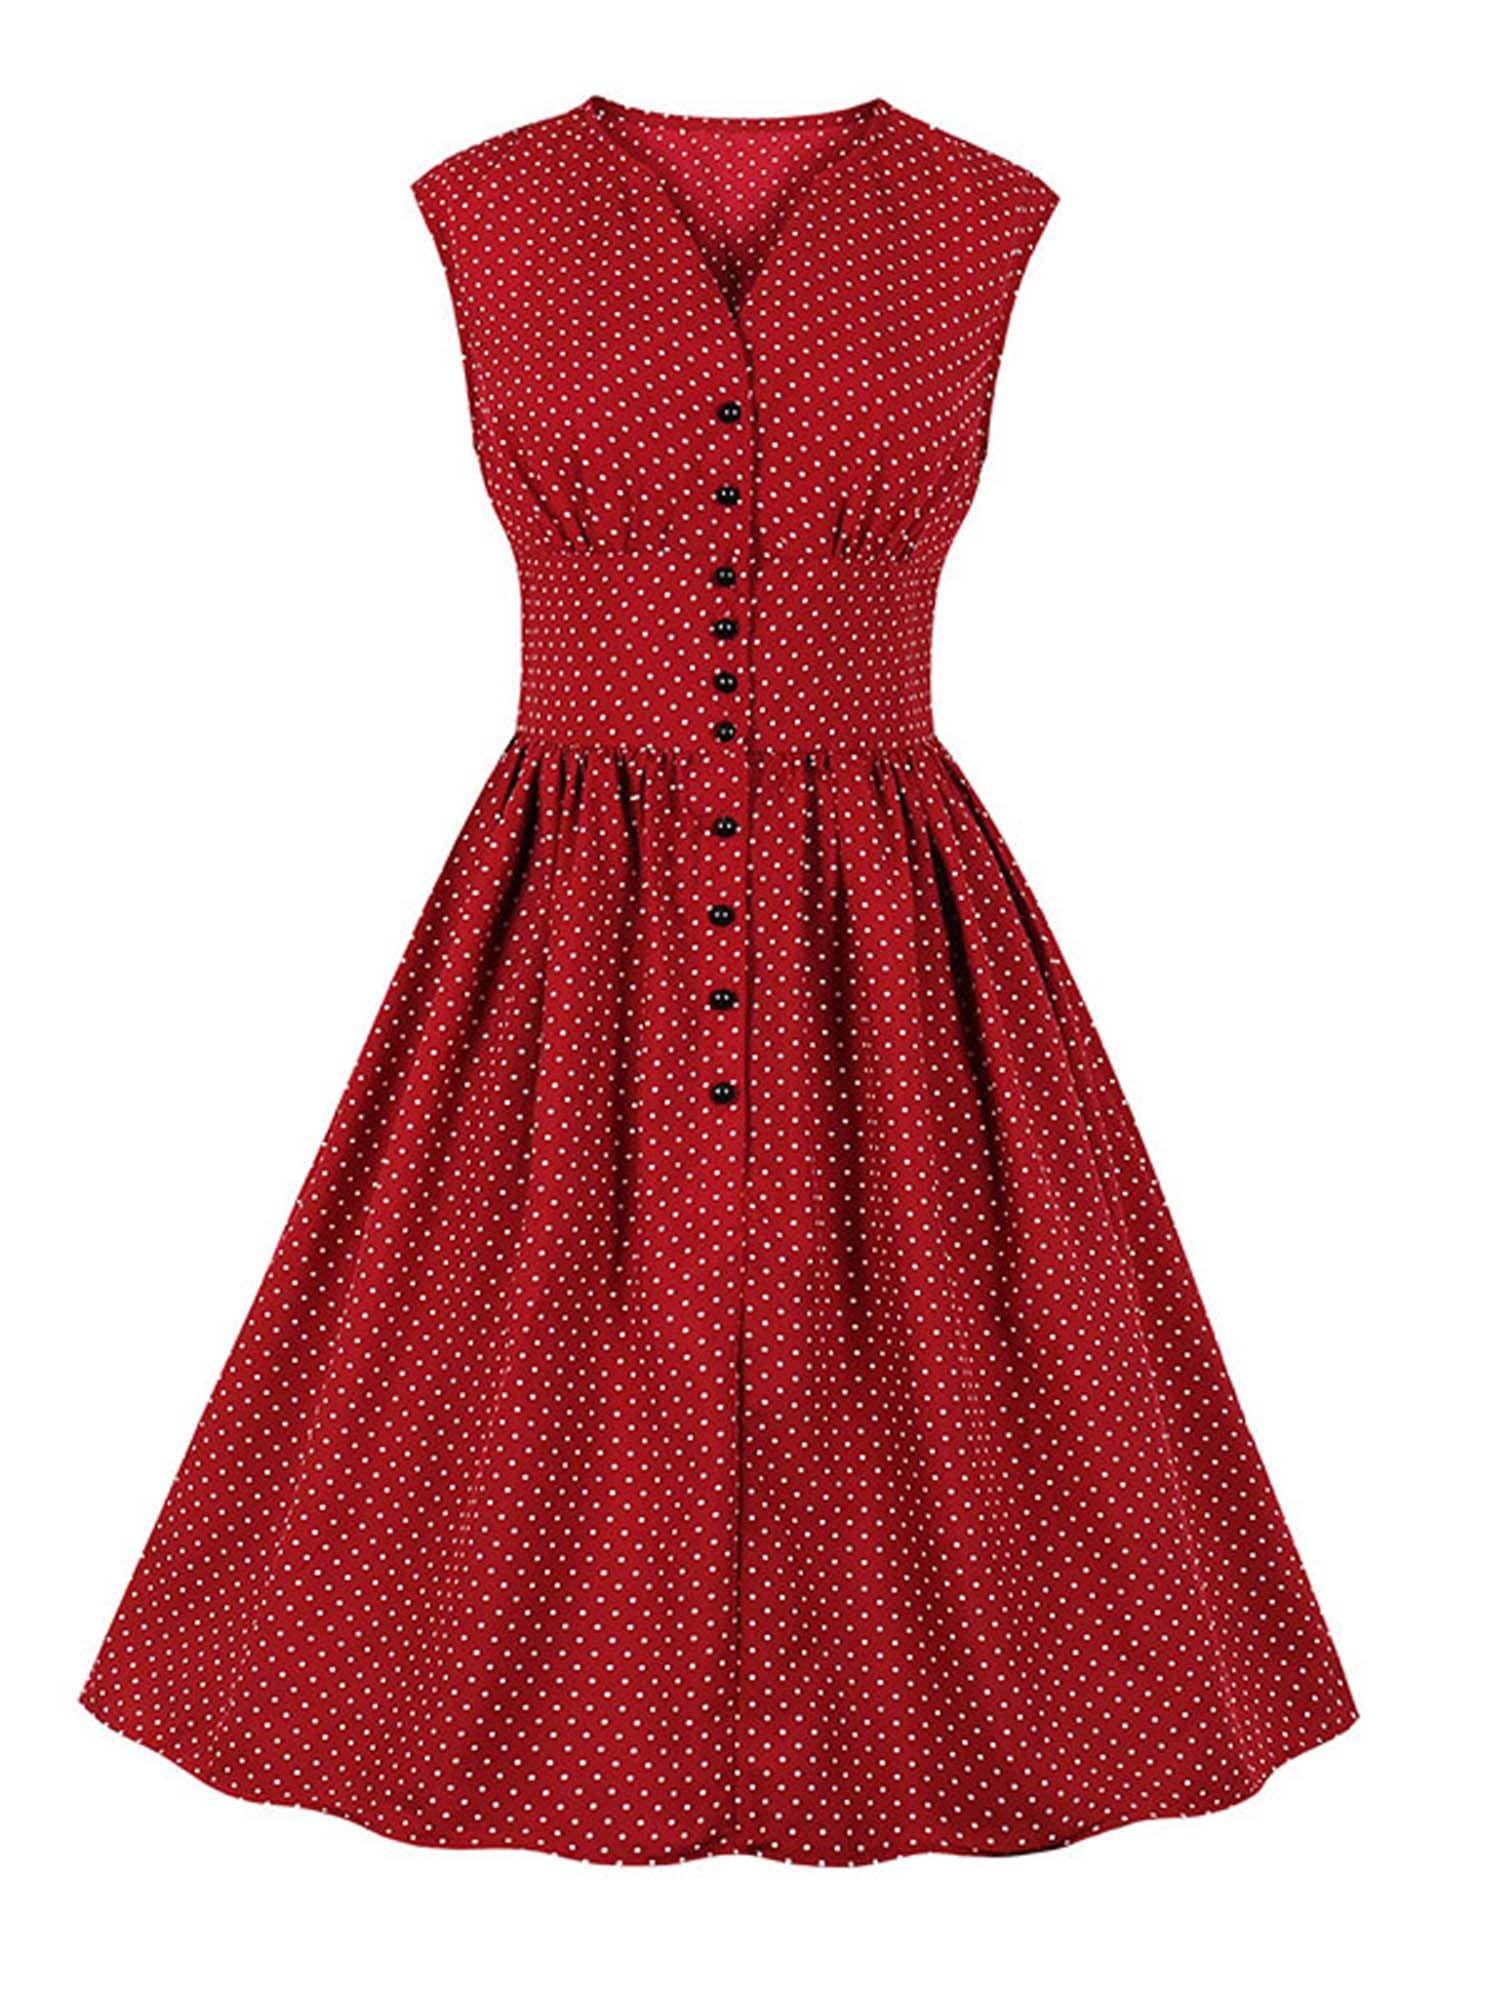 Lallc Women S Button Plus Size Vintage Polka Dot V Neck Swing Midi Dress Walmart Com Retro Red Dress Vintage Dresses Polka Dress [ 2000 x 1500 Pixel ]